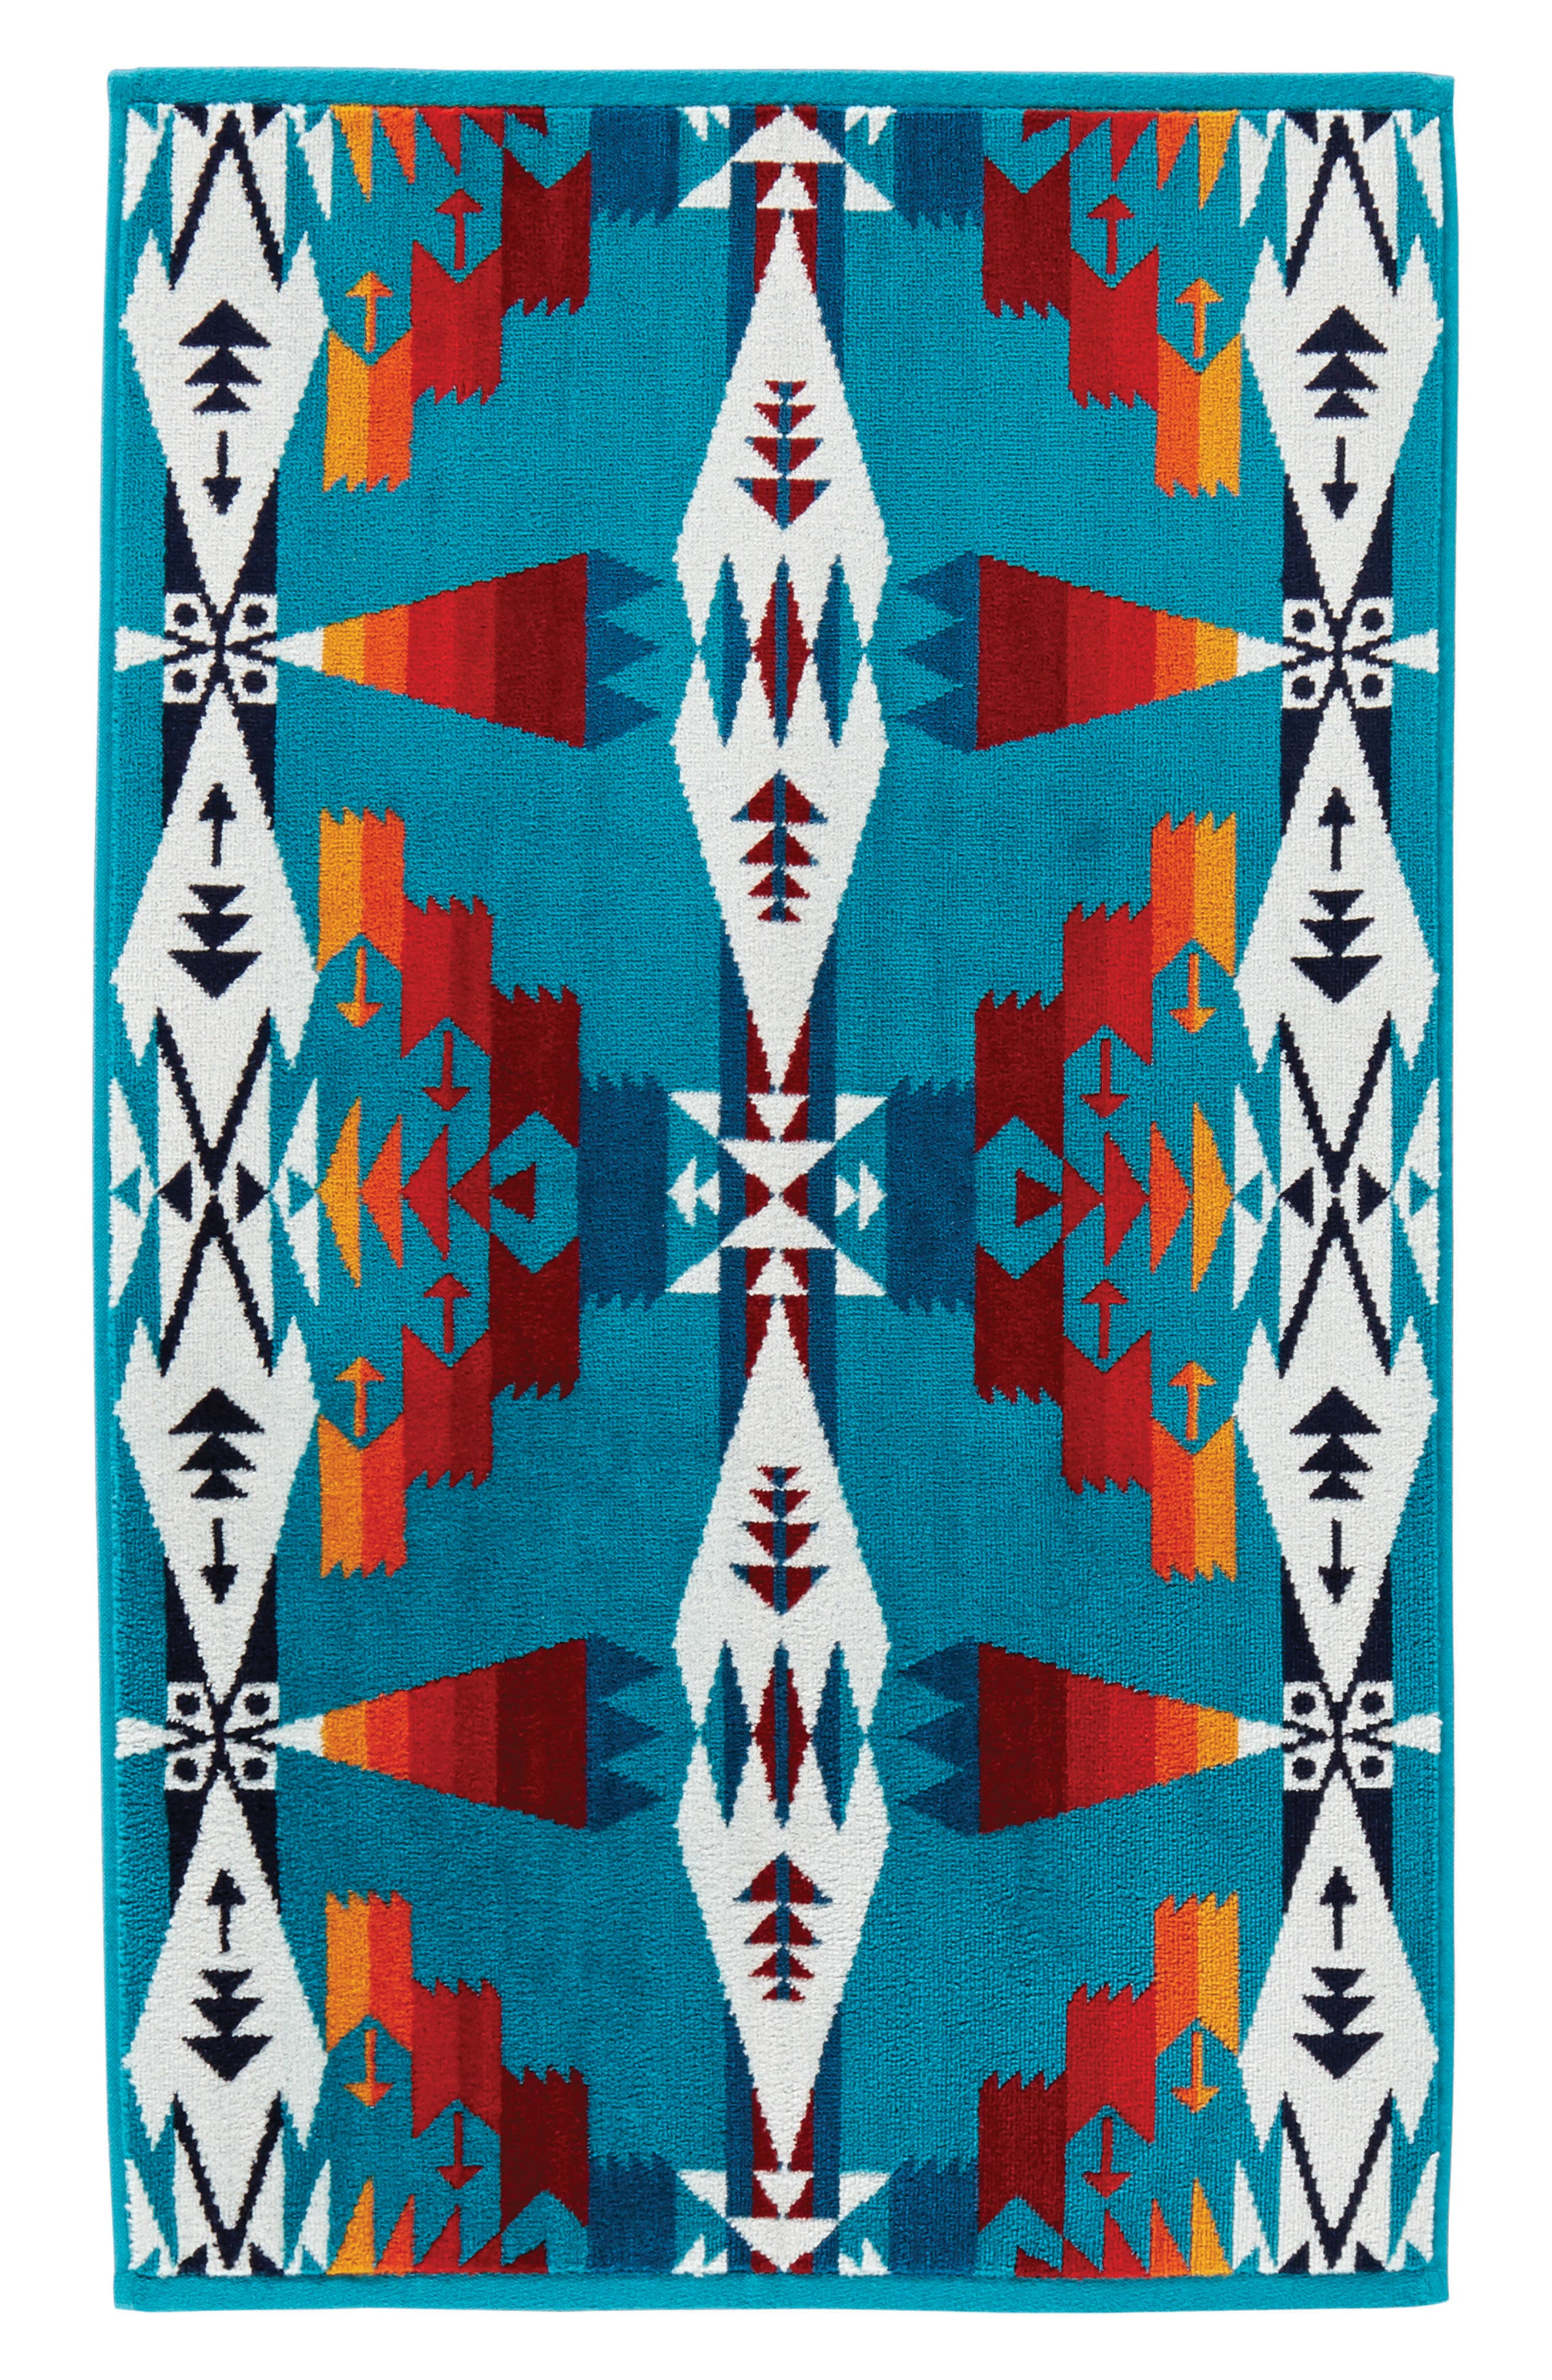 Tucson Hand Towel,                             Main thumbnail 1, color,                             Tucson Turquoise